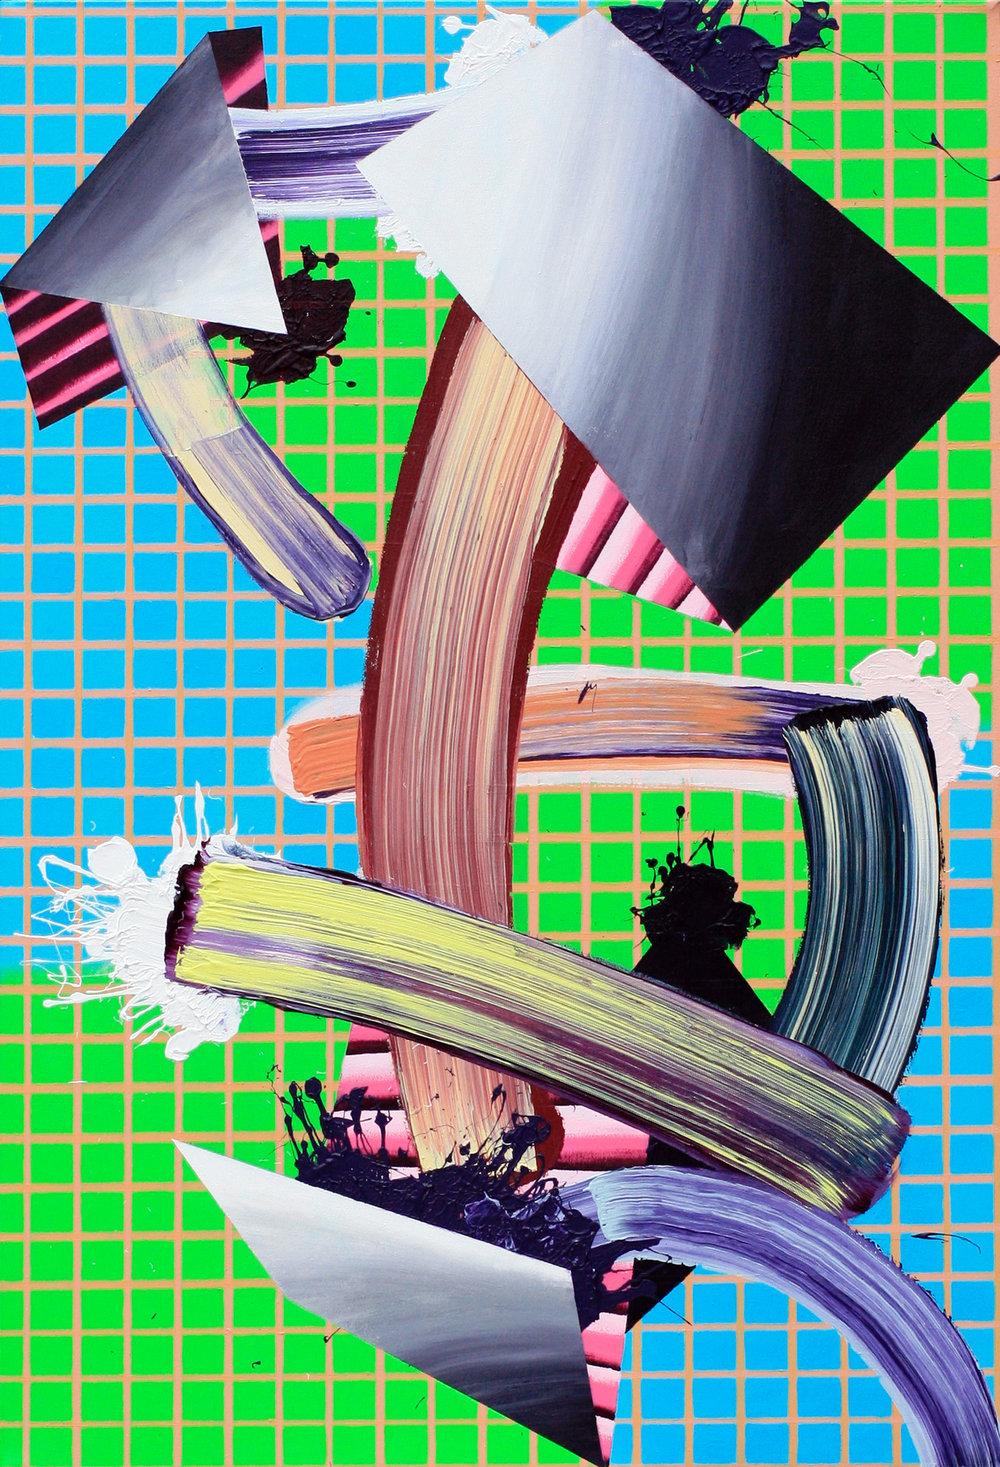 MattSheridan_Intersectional_Painting_50x34__2017_$2750.jpg